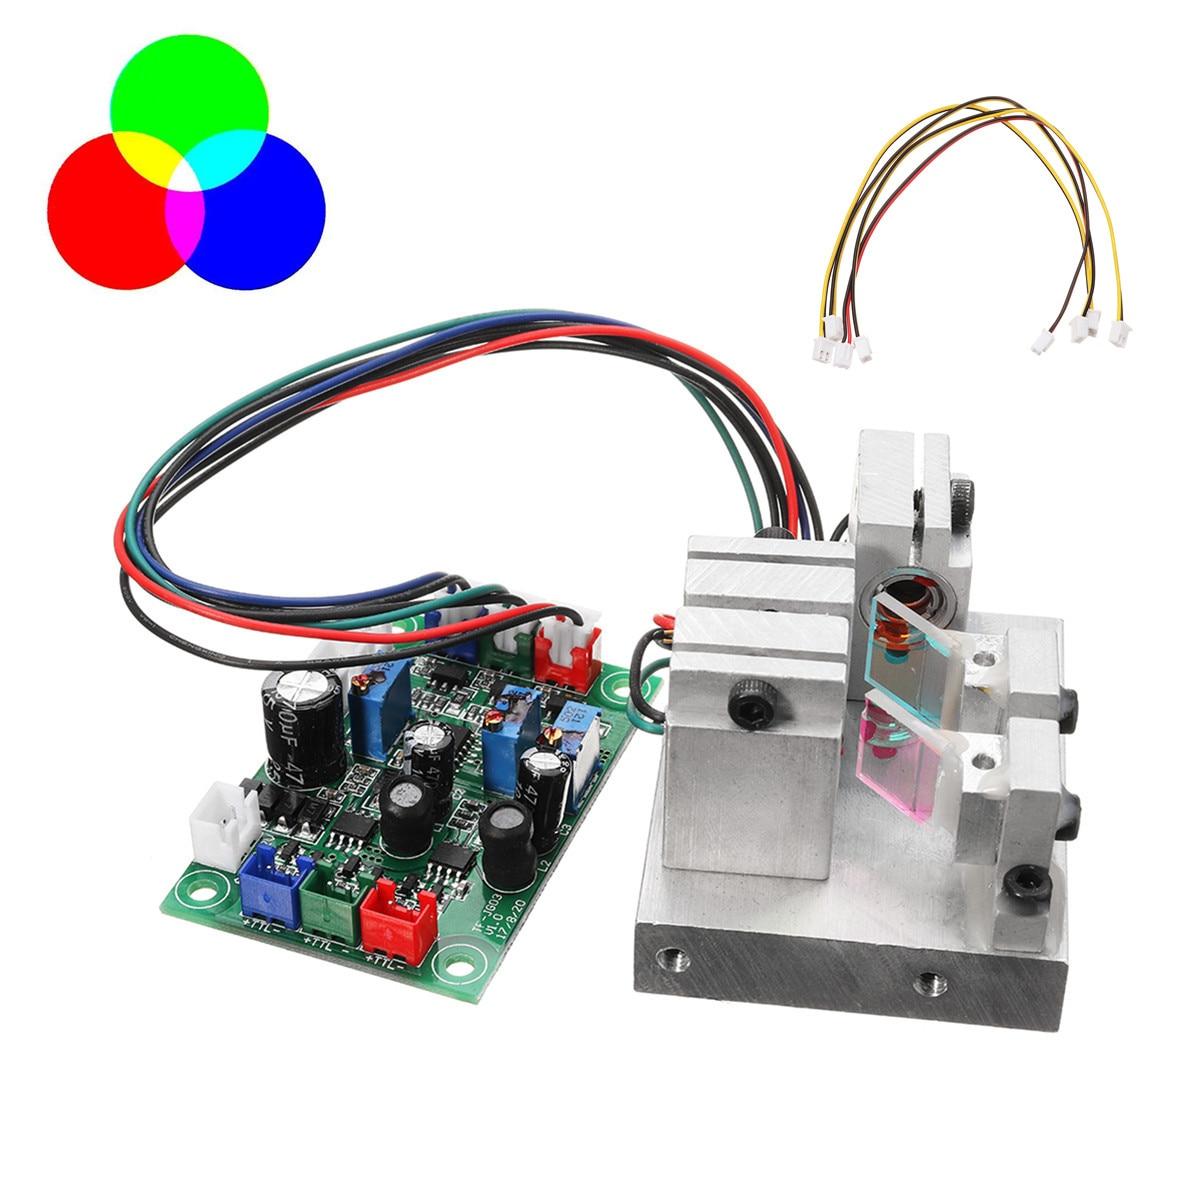 638nm + 520nm + 450nm с TTL драйвер платы RGB 300mW белый лазерный модуль модуляция Защита температуры точность науки